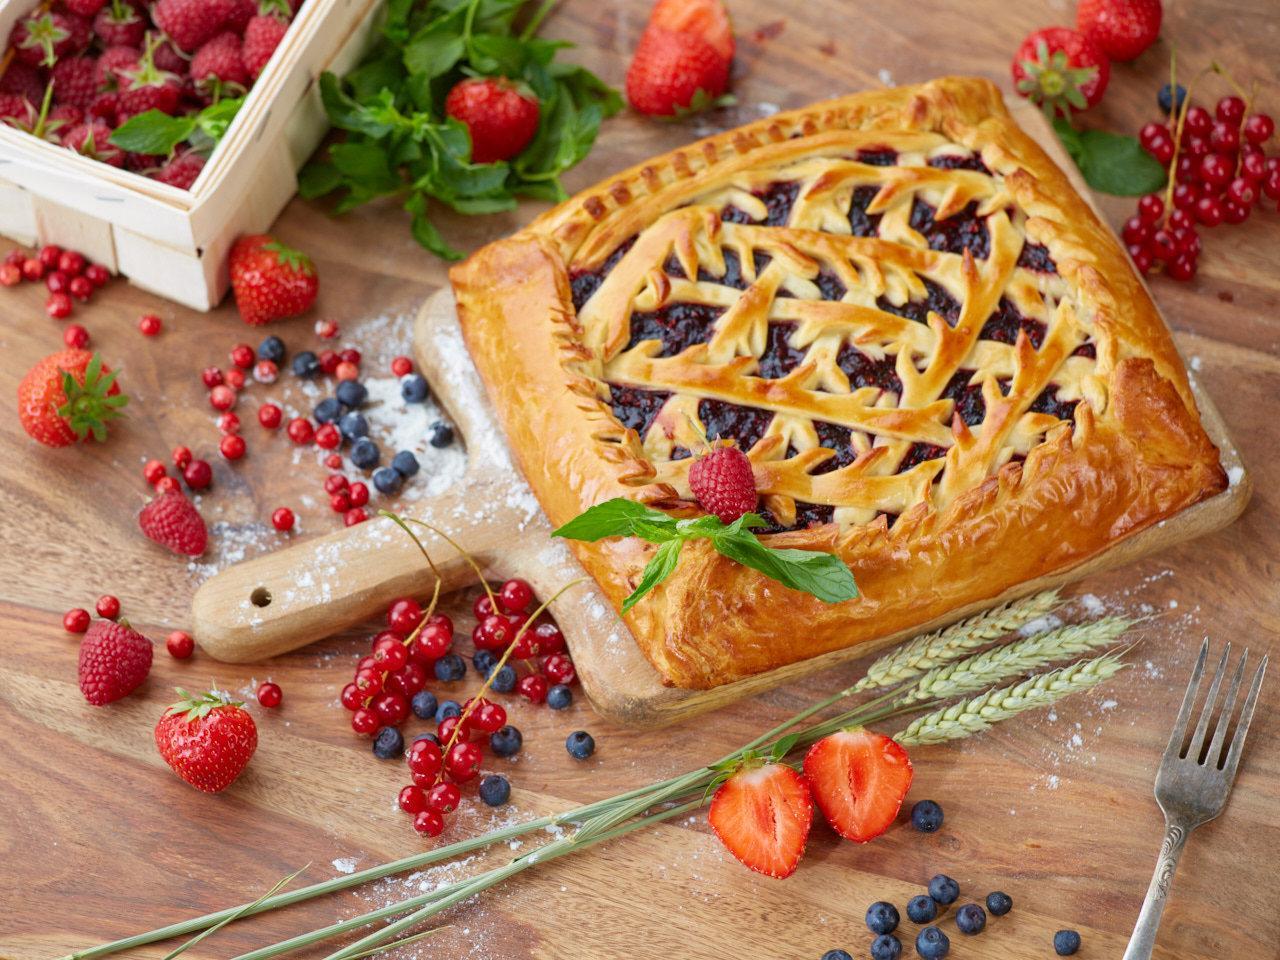 фотография Пекарни Просто Вкусно Пироги на проспекте Мира